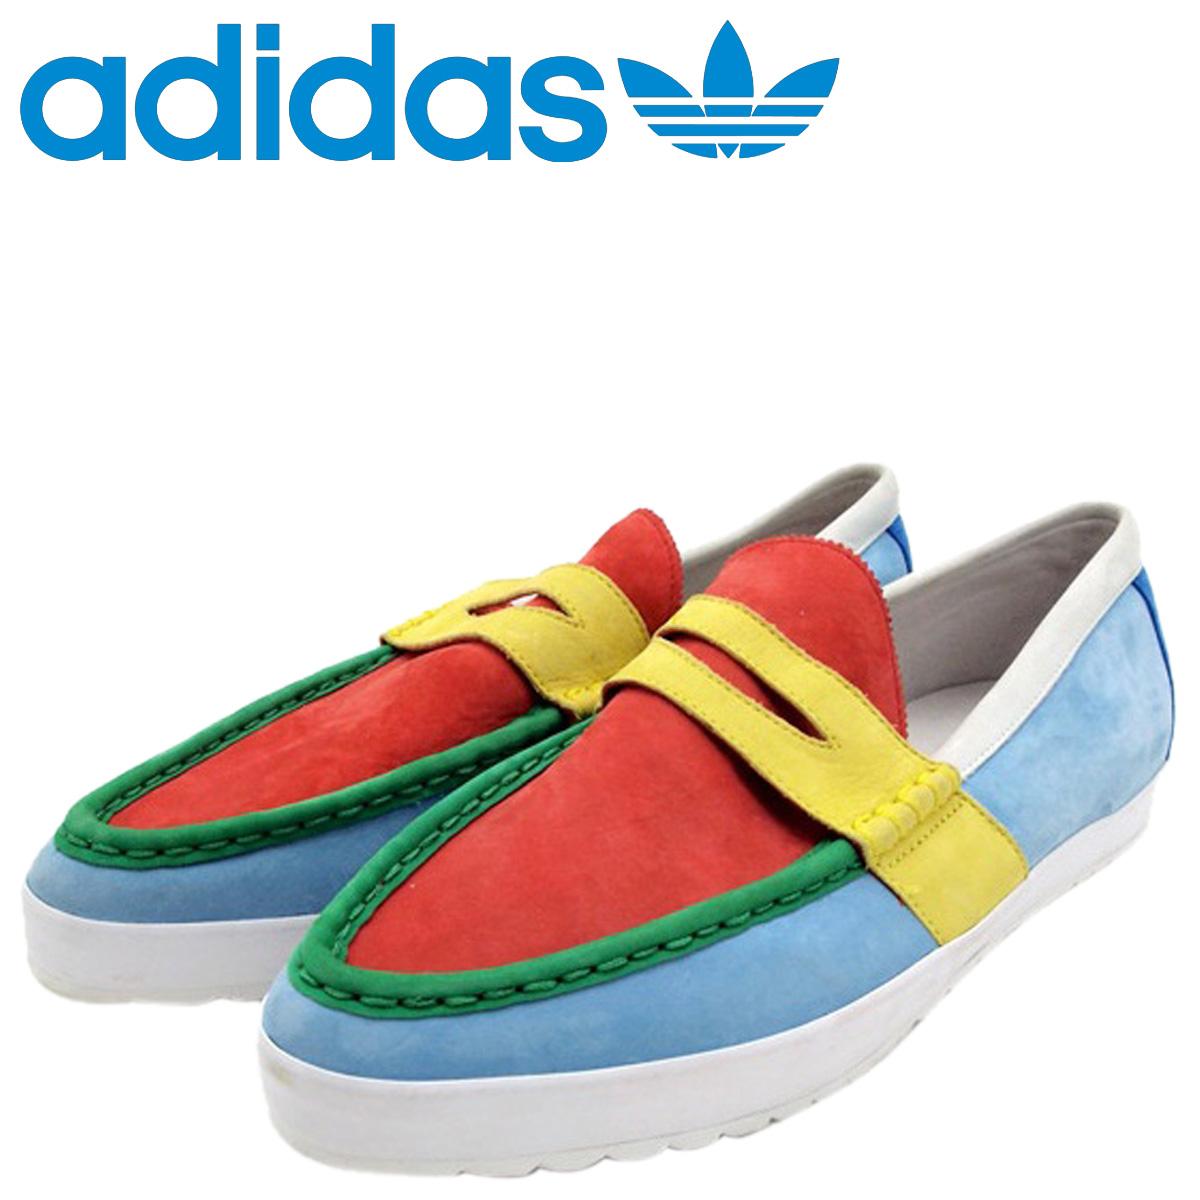 adidas Originals Adidas originals penny loafer Jeremy Scot OBYO JEREMY SCOTT PENNY LOAFER SLIM V22822 men gap Dis